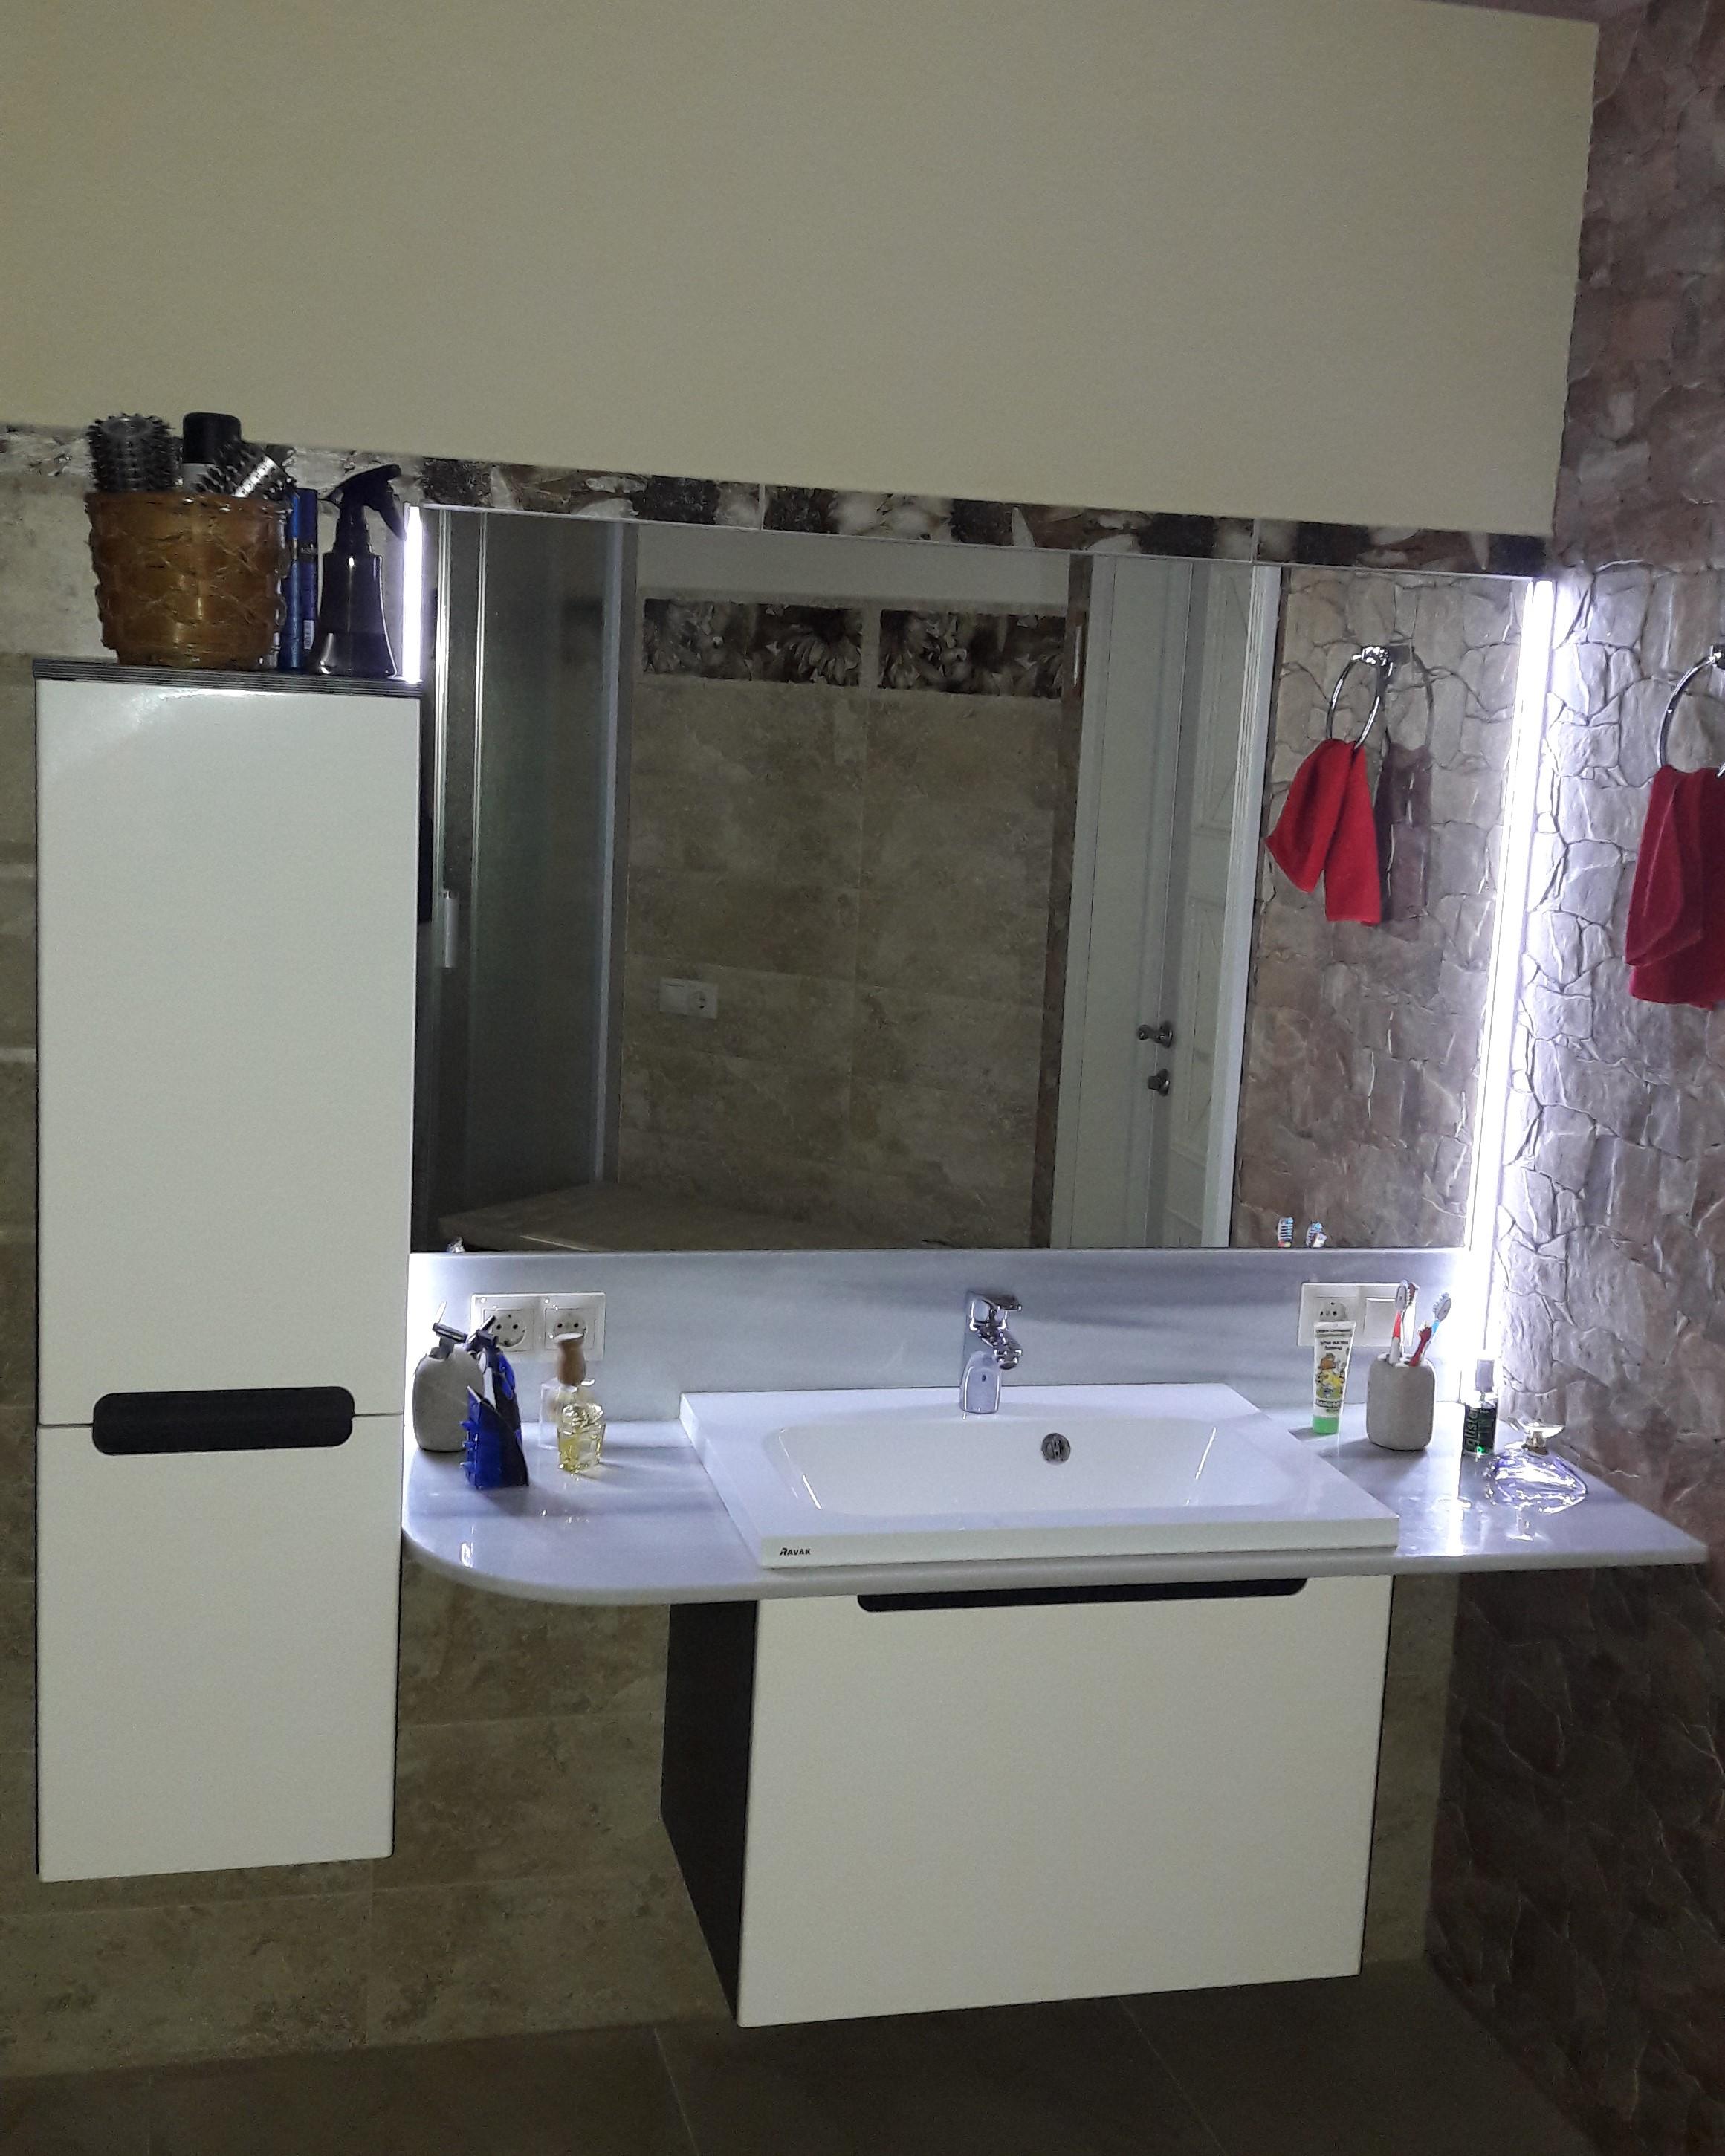 Фото Штукатурка, покраска, укладка плитки, установка мебели, зеркала